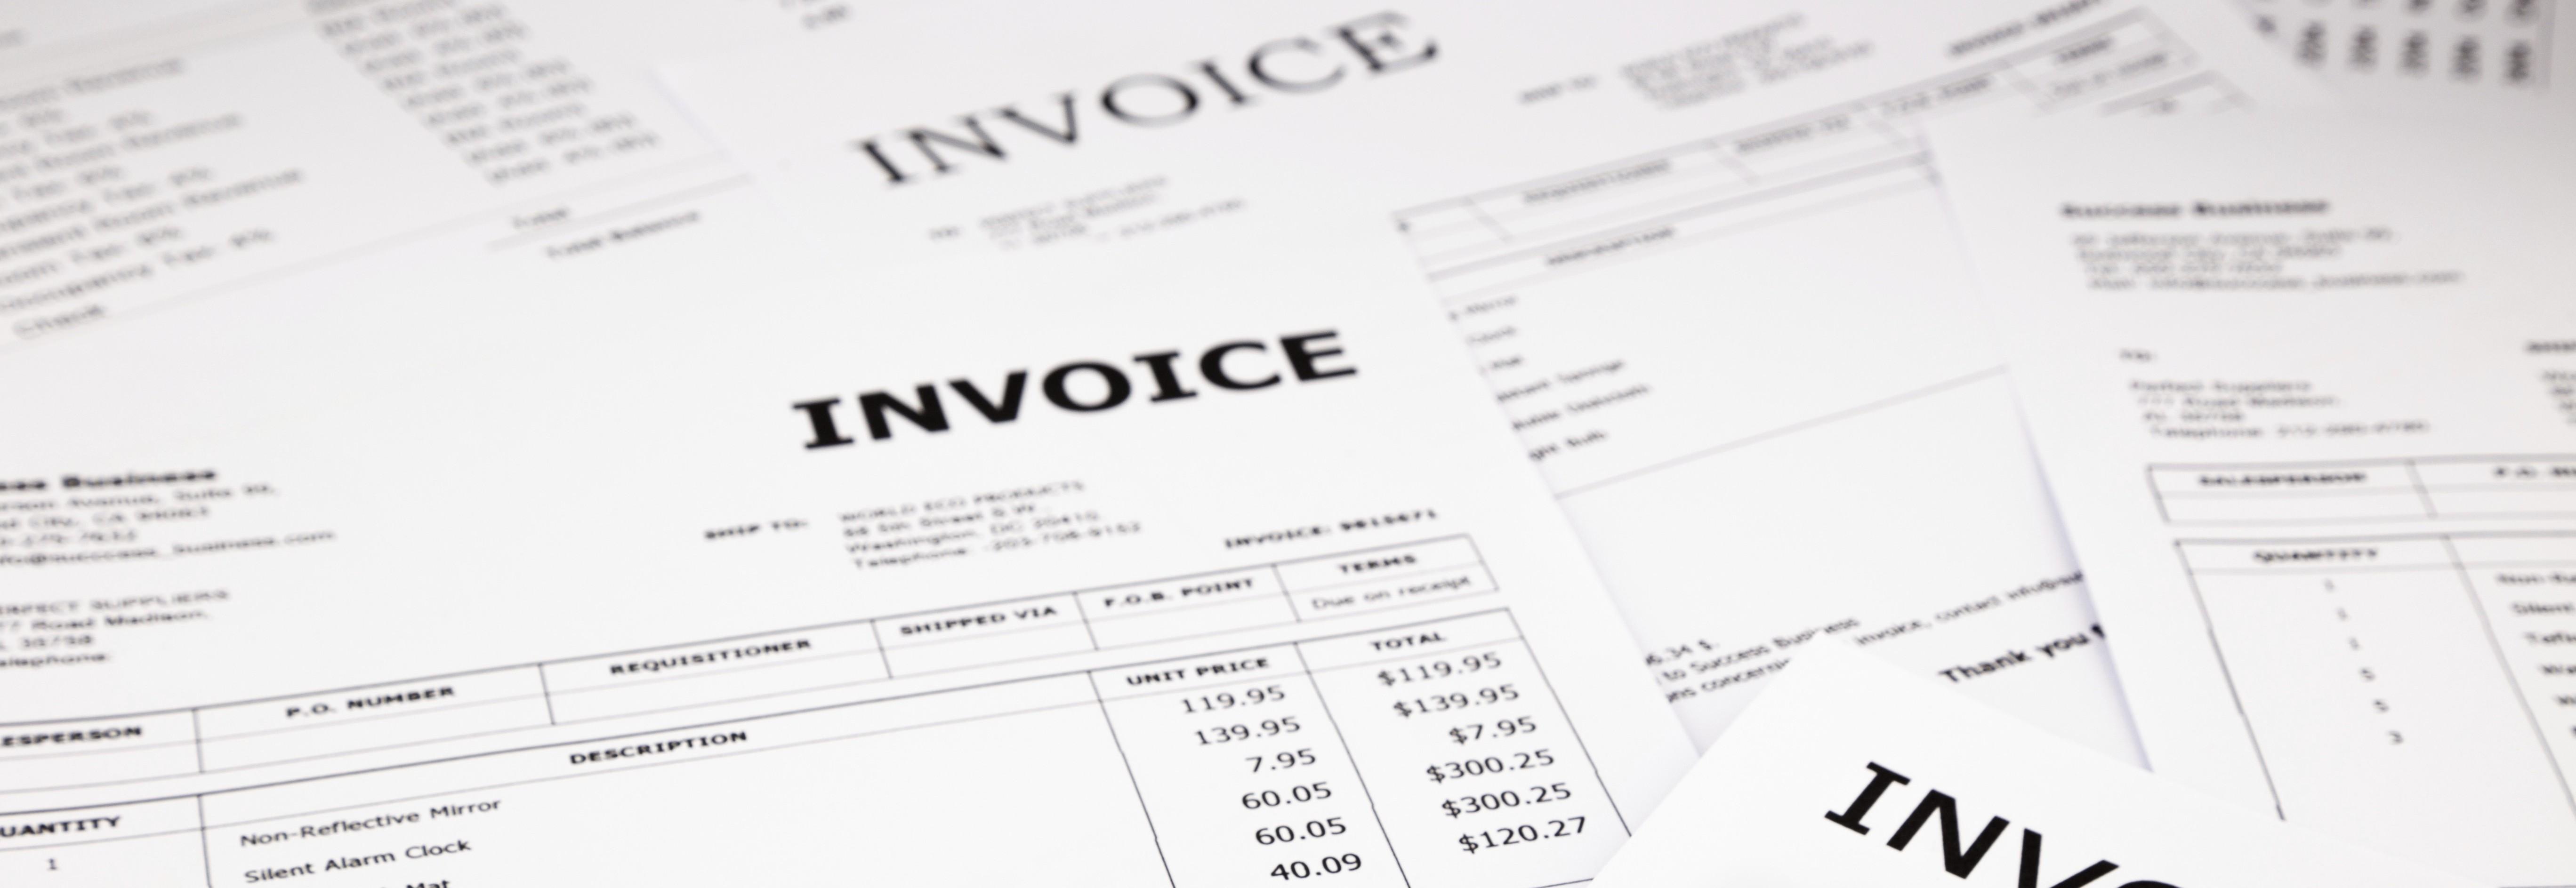 Invoice Capture Mi Invoices supports invoice capture via Paper, Email, File Transfer or EDI